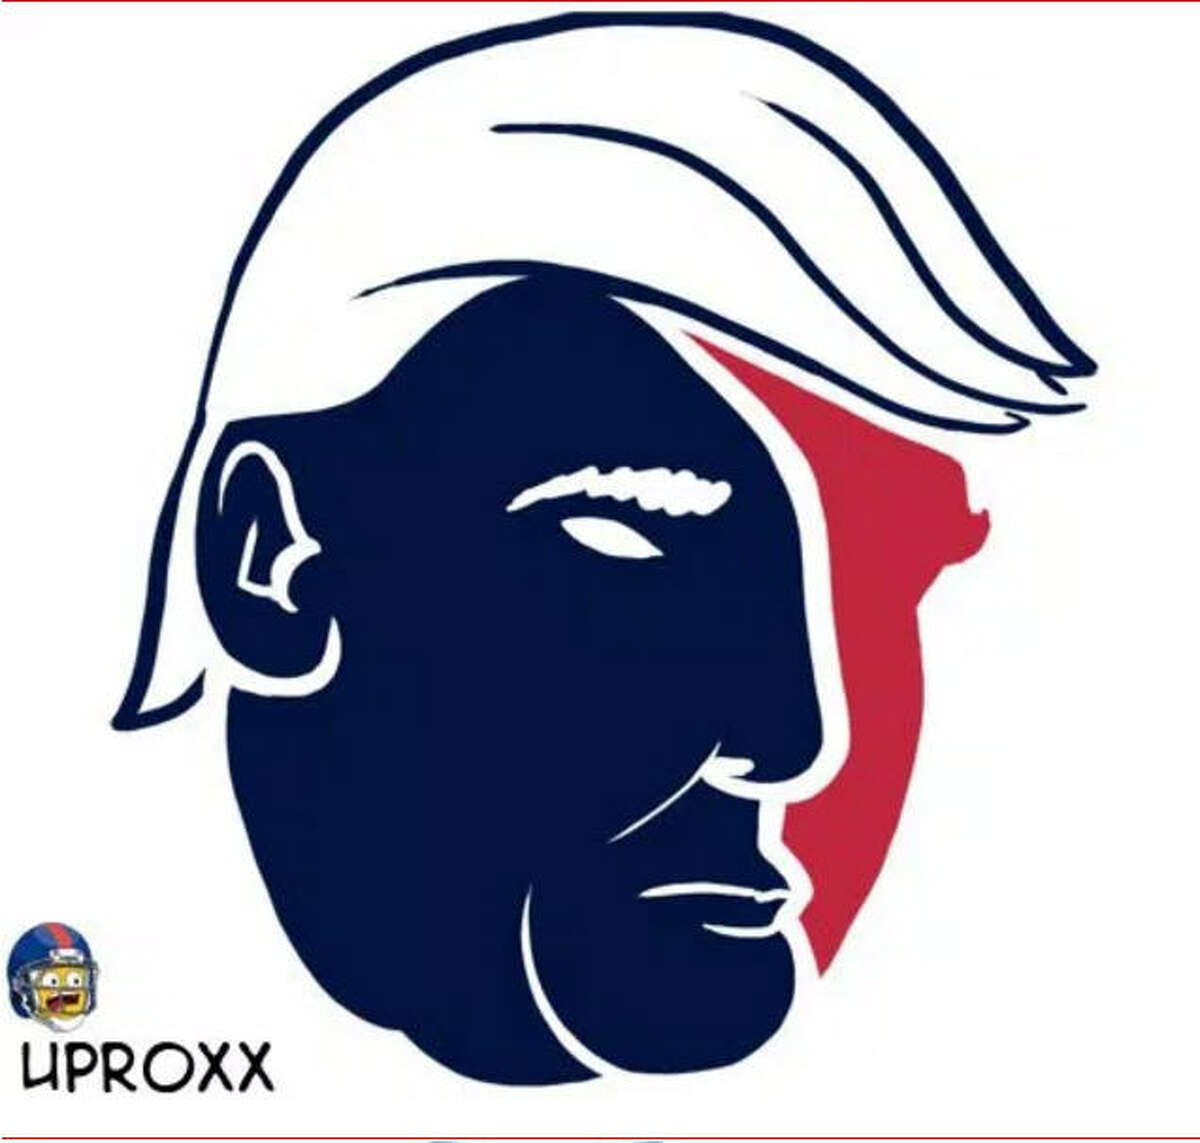 Houston Texans as Donald Trump